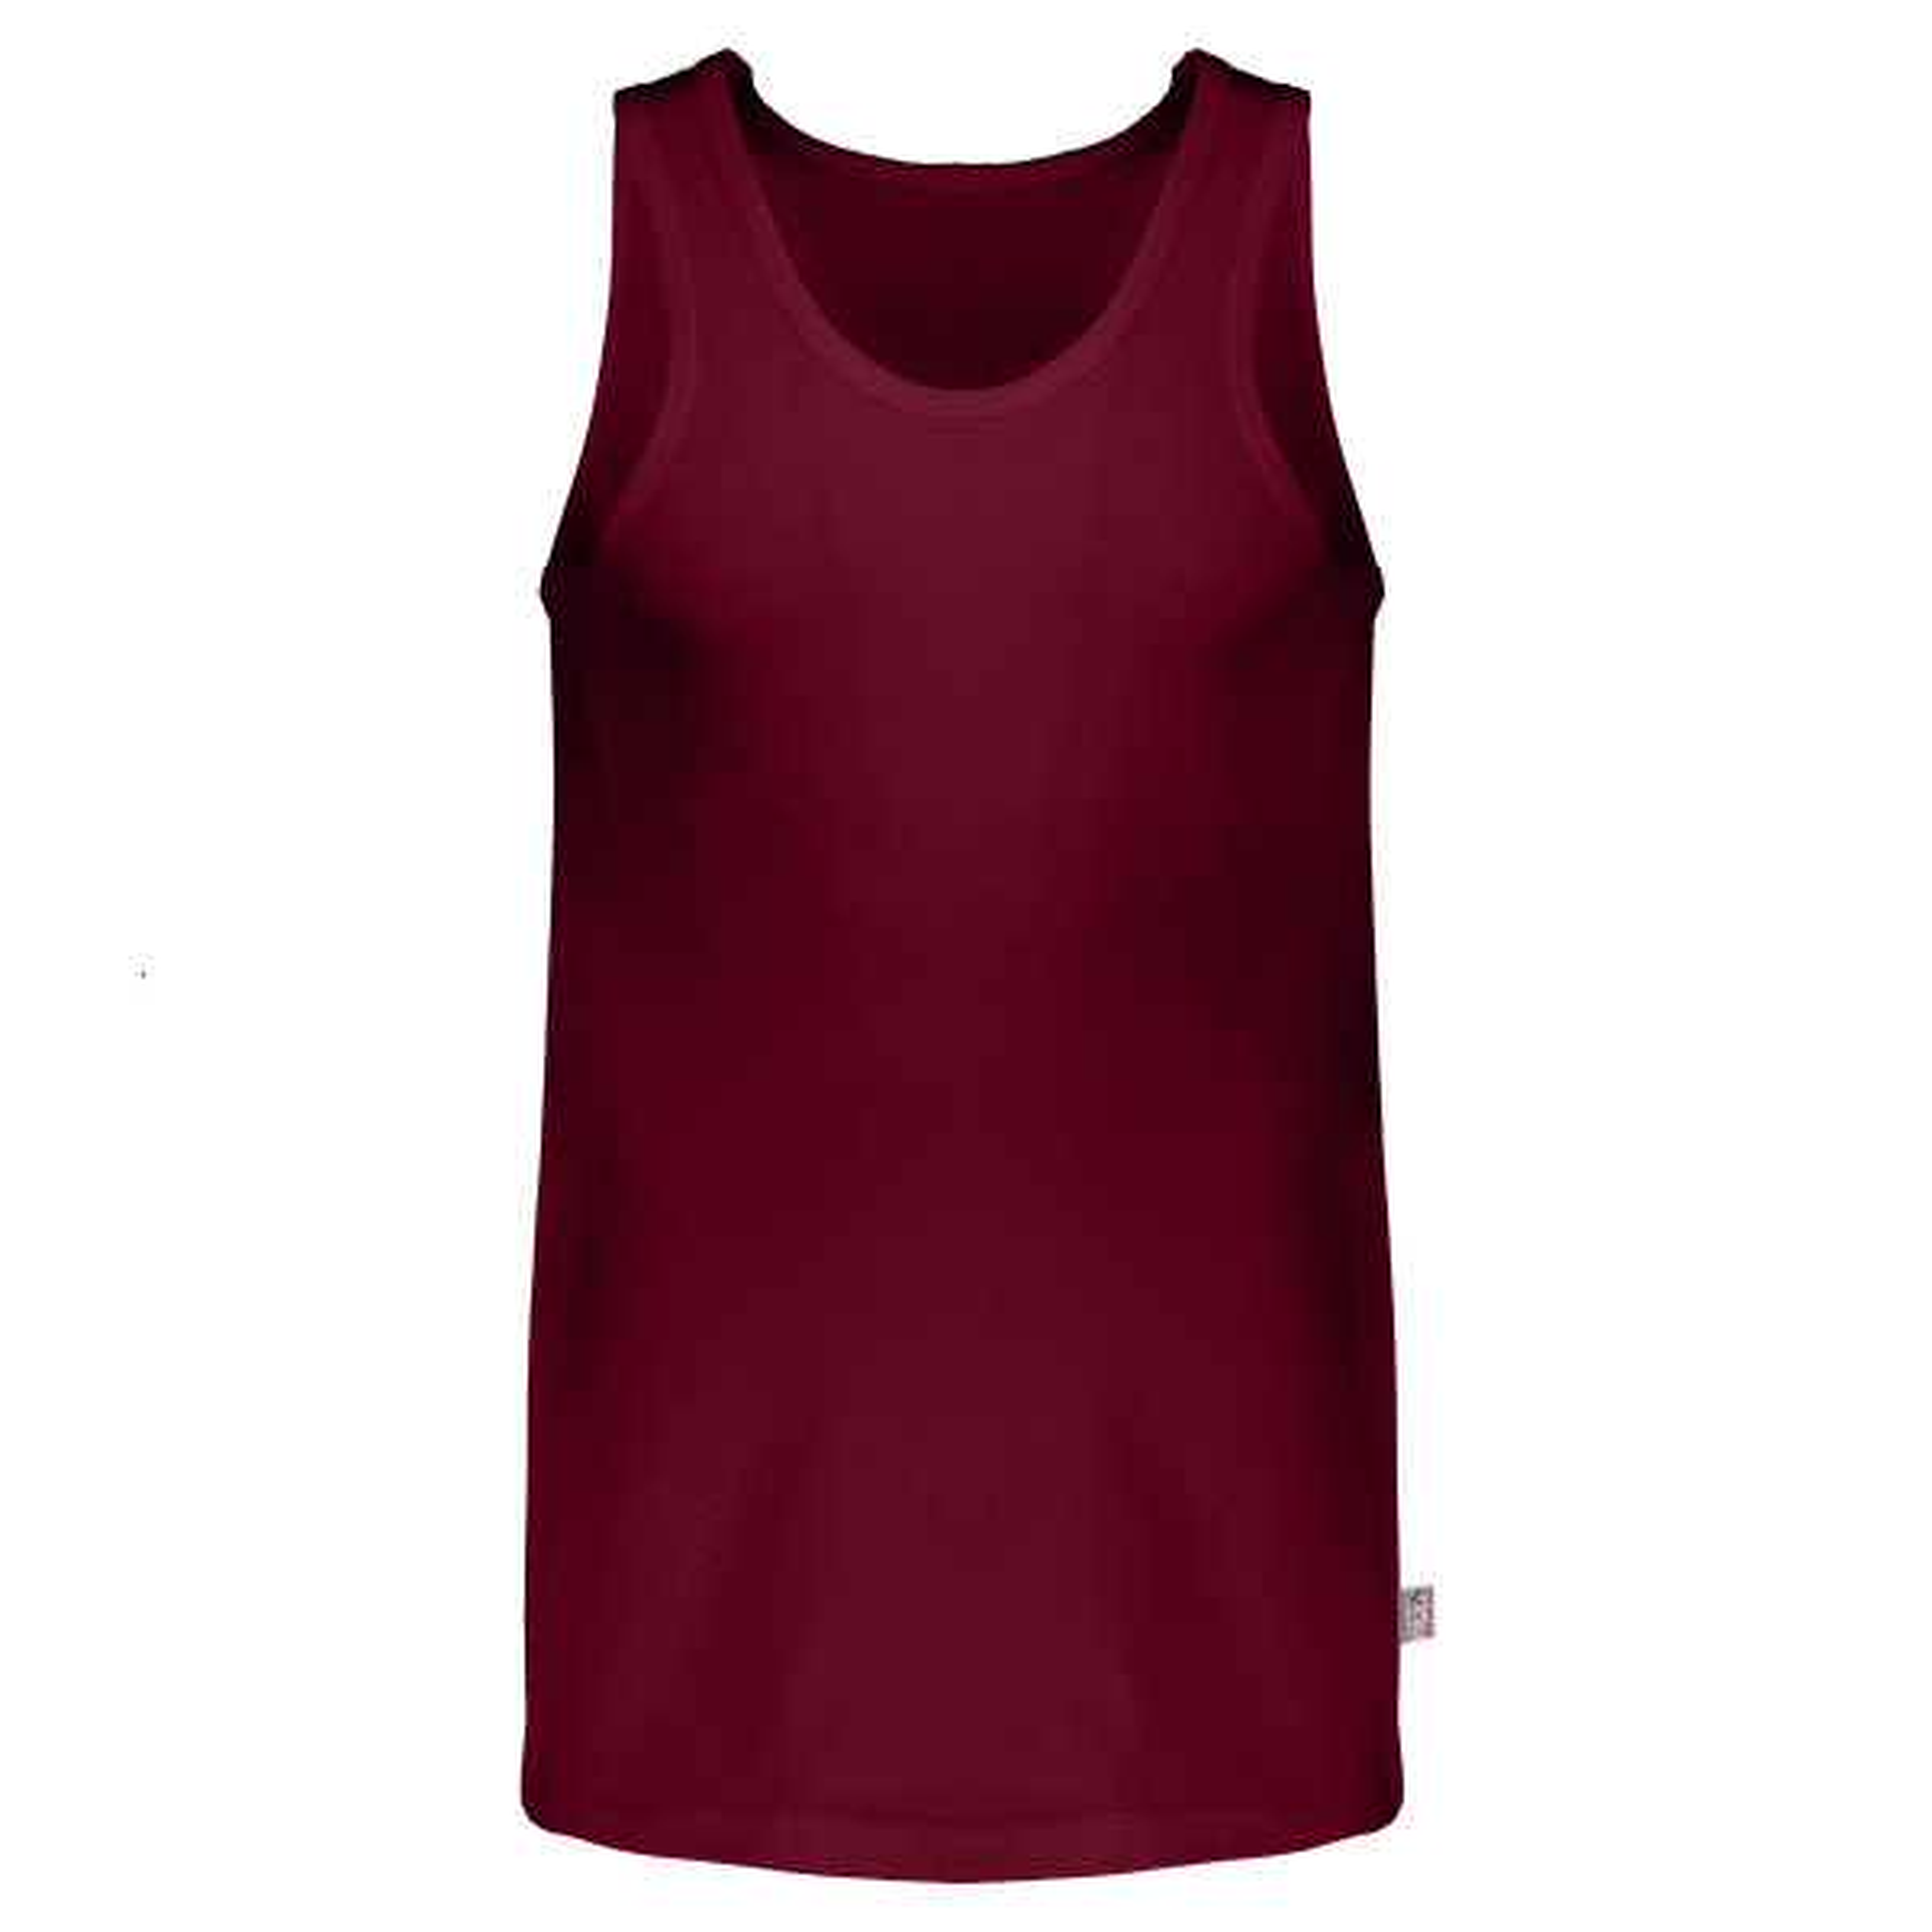 زیرپوش مردانه بهپوش کد RP103 رنگ زرشکی